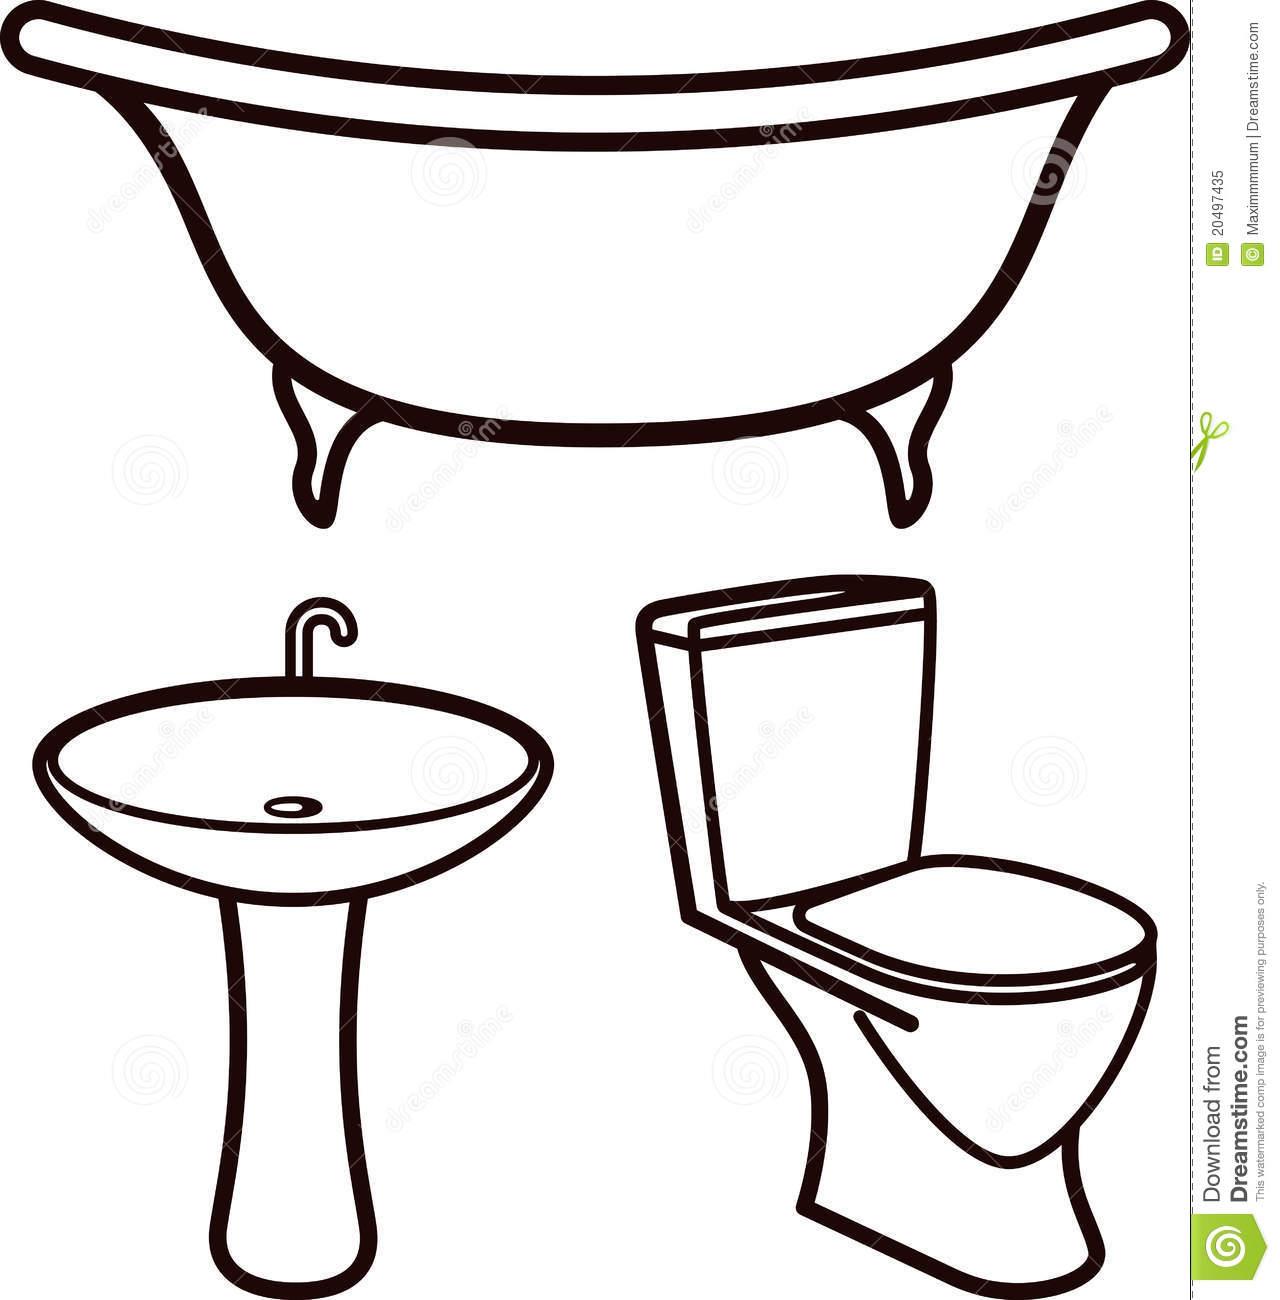 1280x1300 Toilet Clipart Bathroom Sink